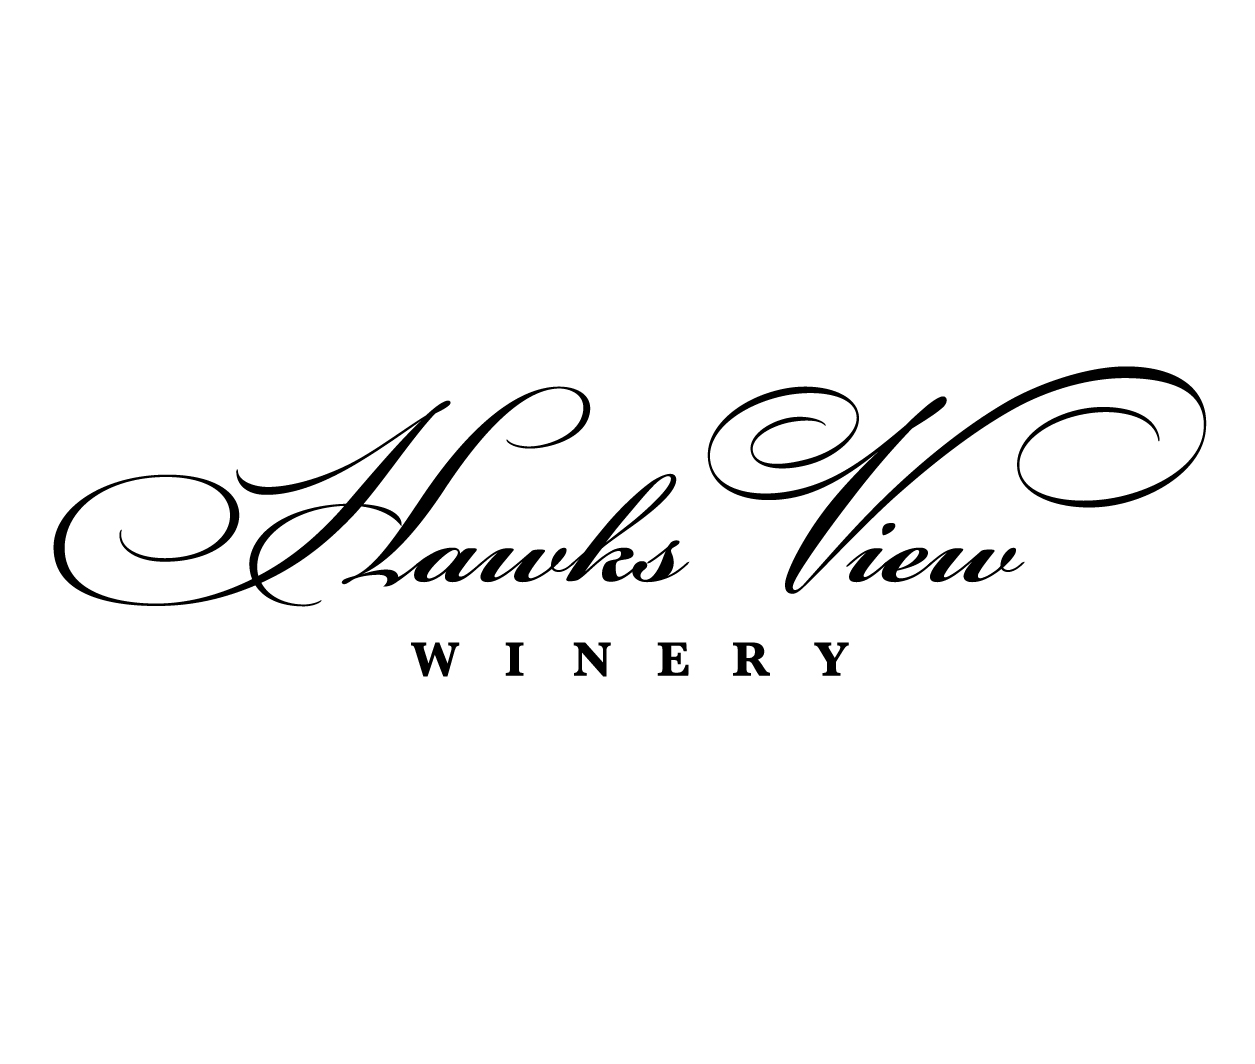 Hawks View Logo.jpg